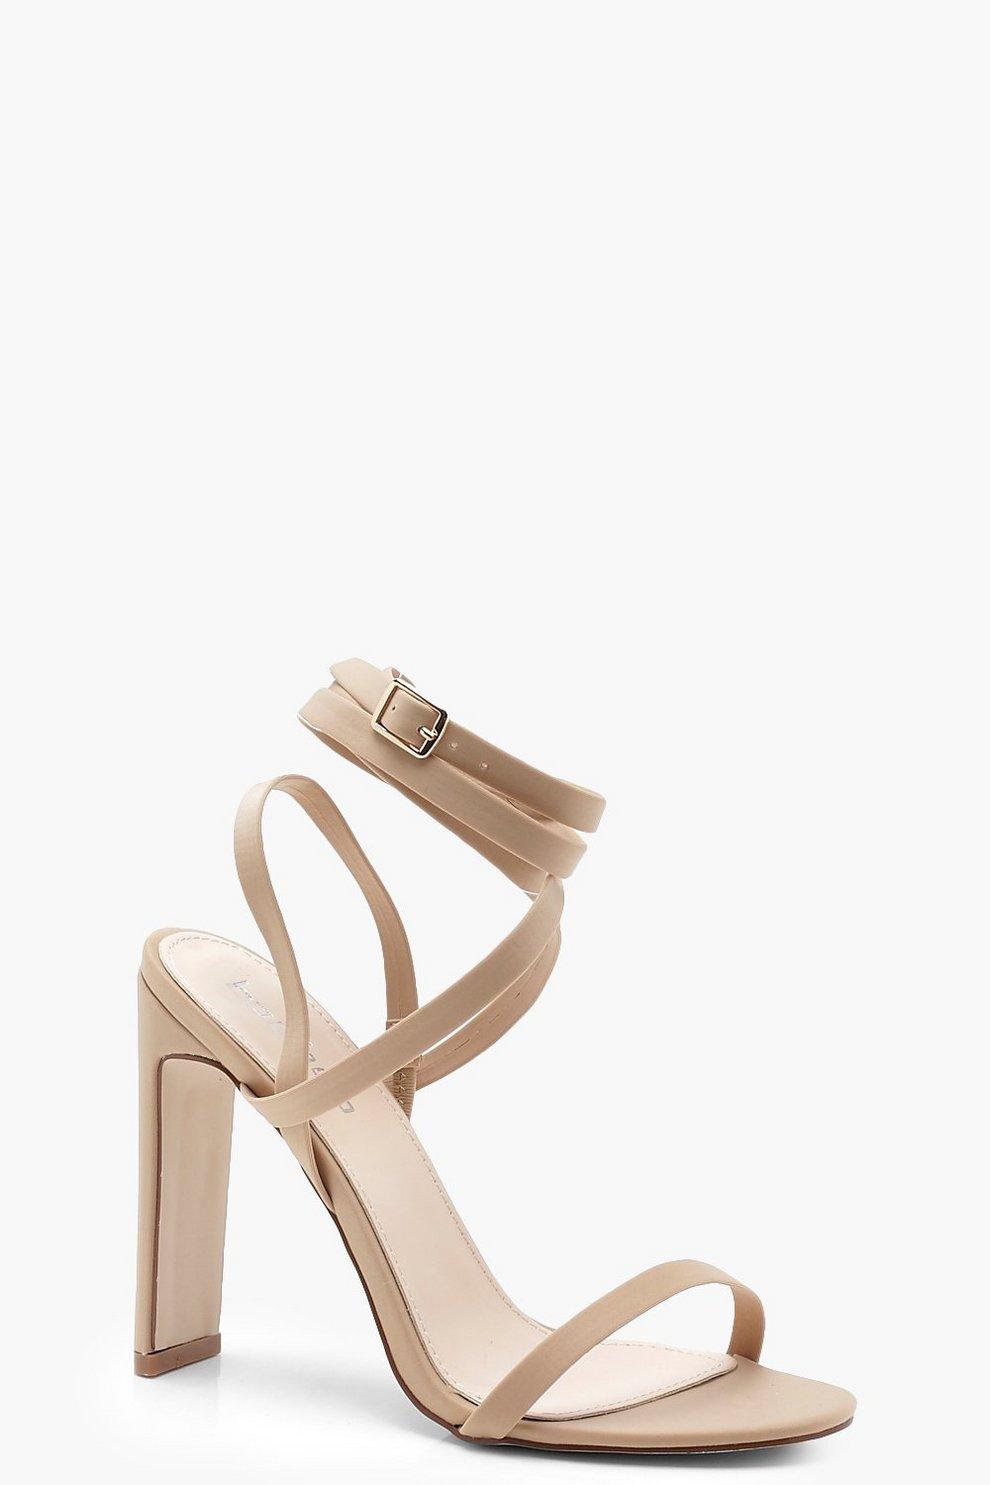 4a486781226 Skinny Block Heel Wrap Strap Sandals